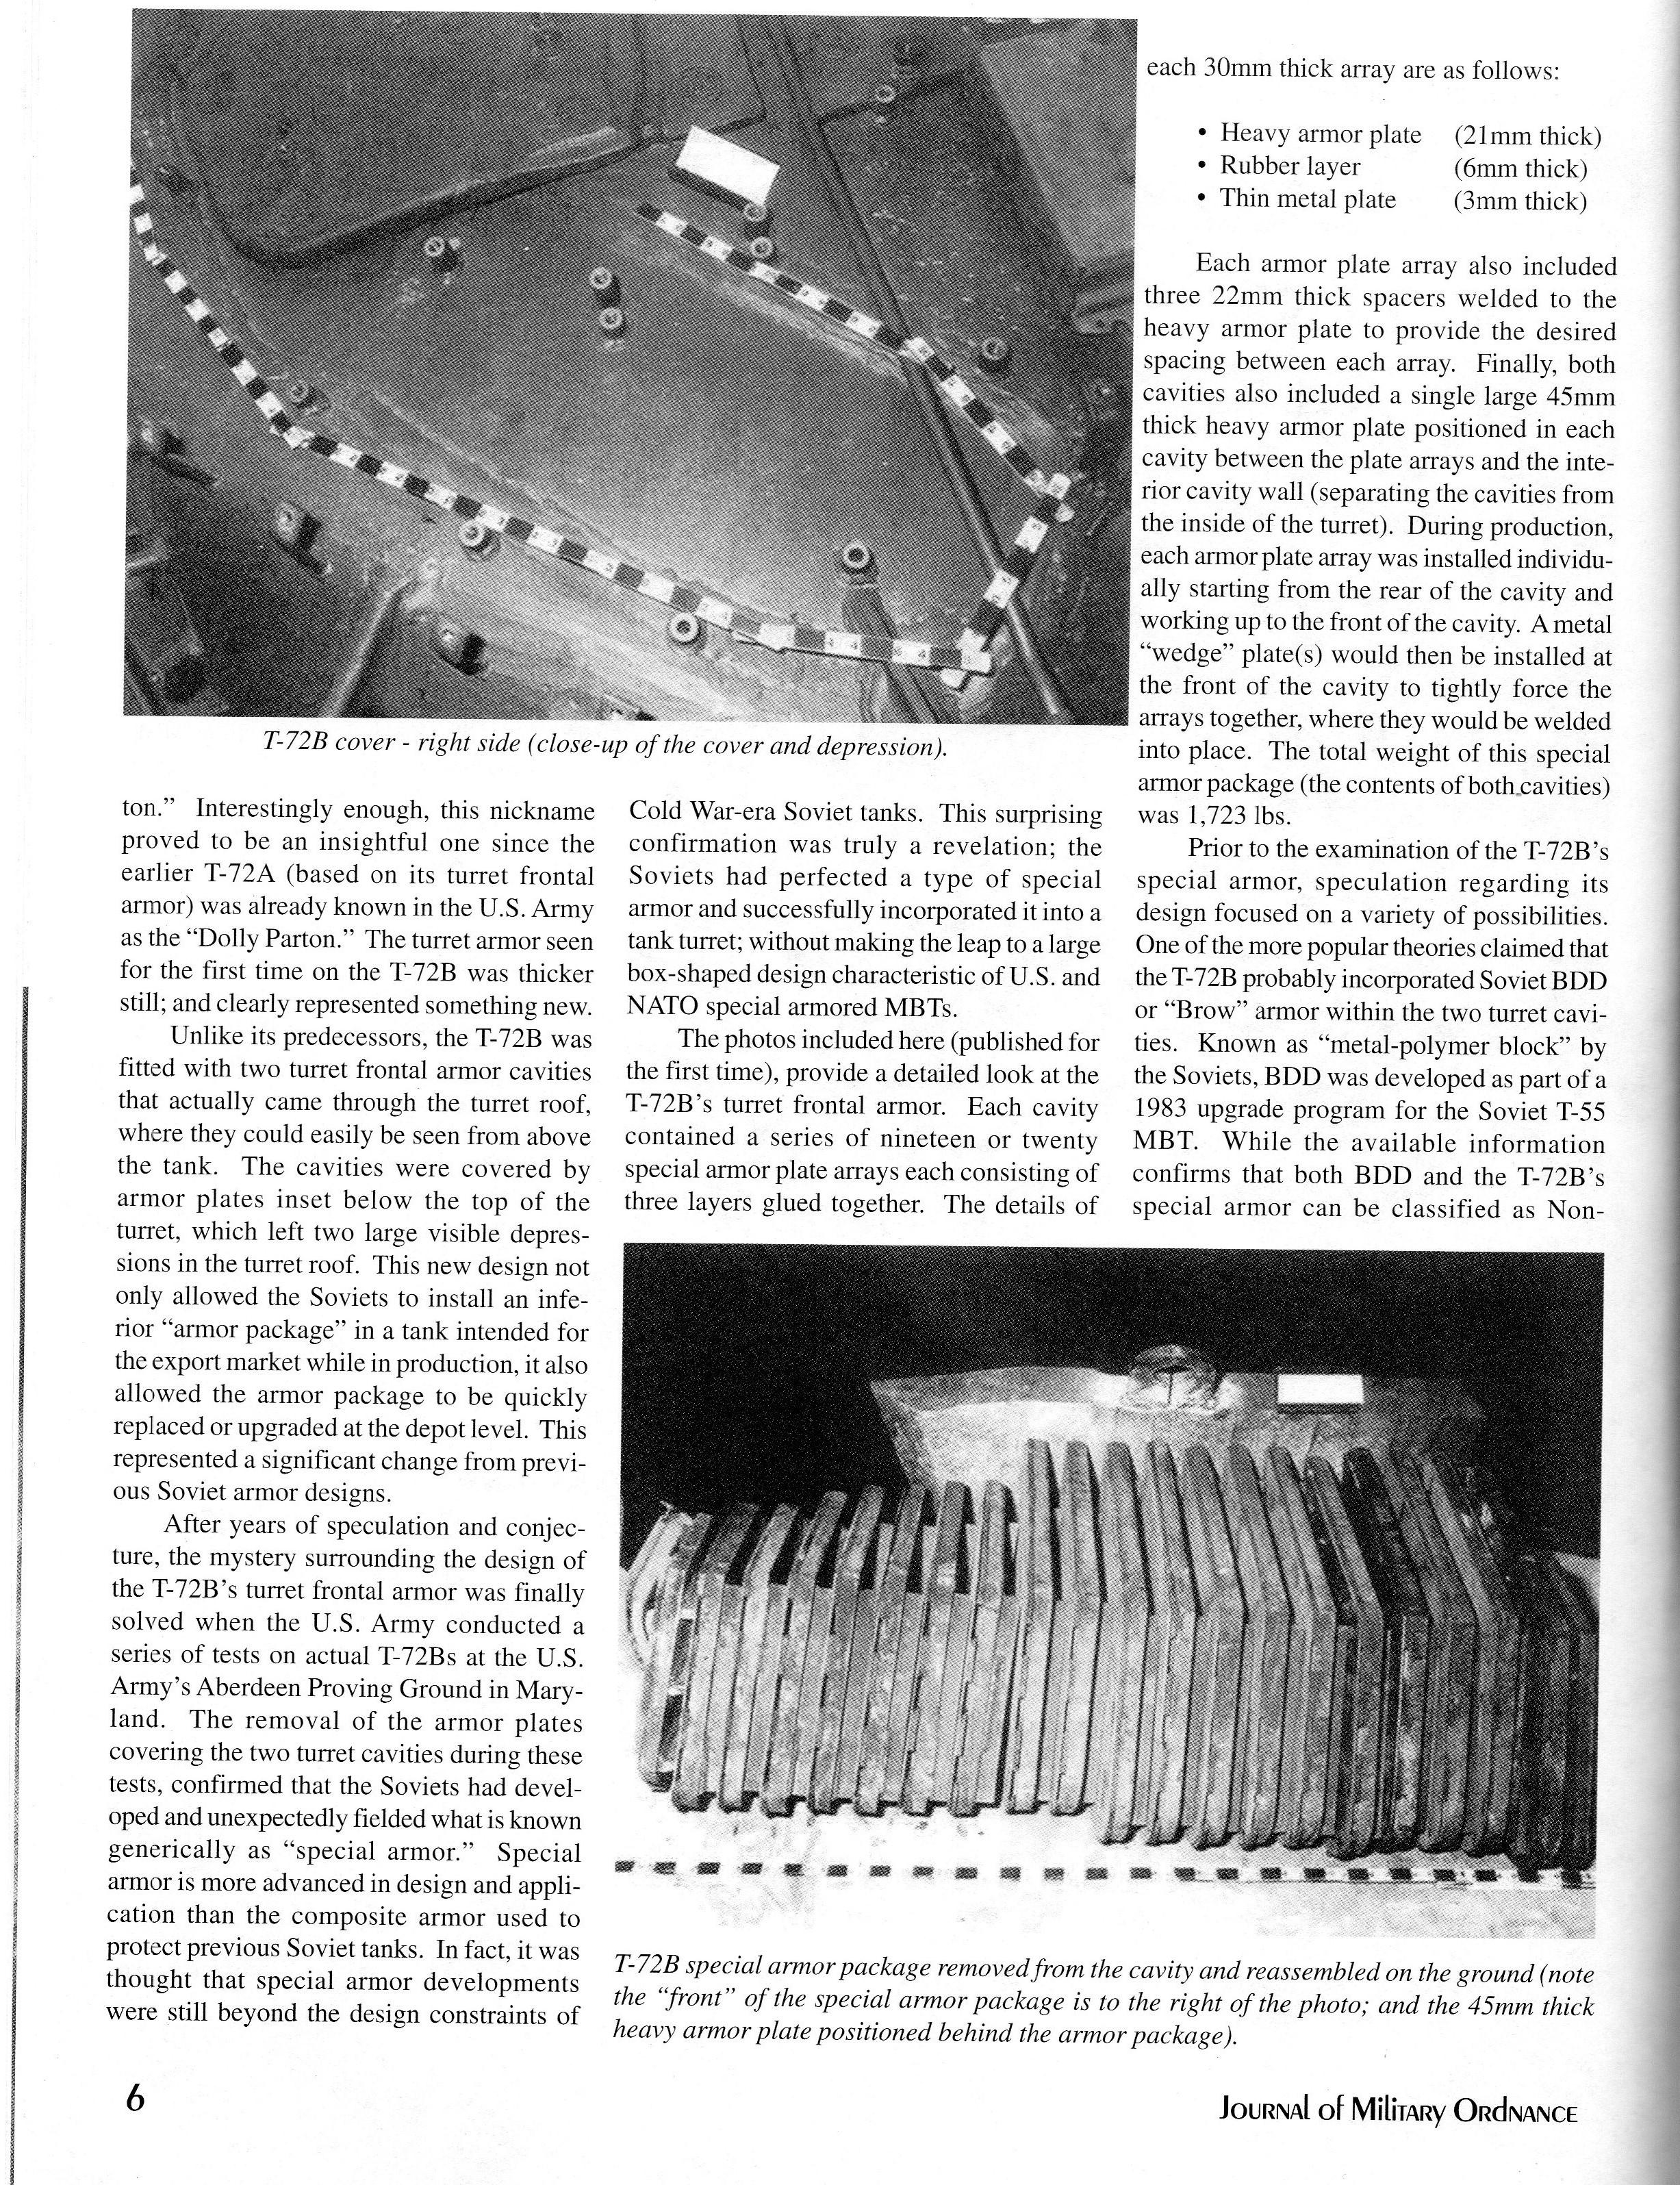 t-72b-armor-article_jmo_may2002_4.jpg